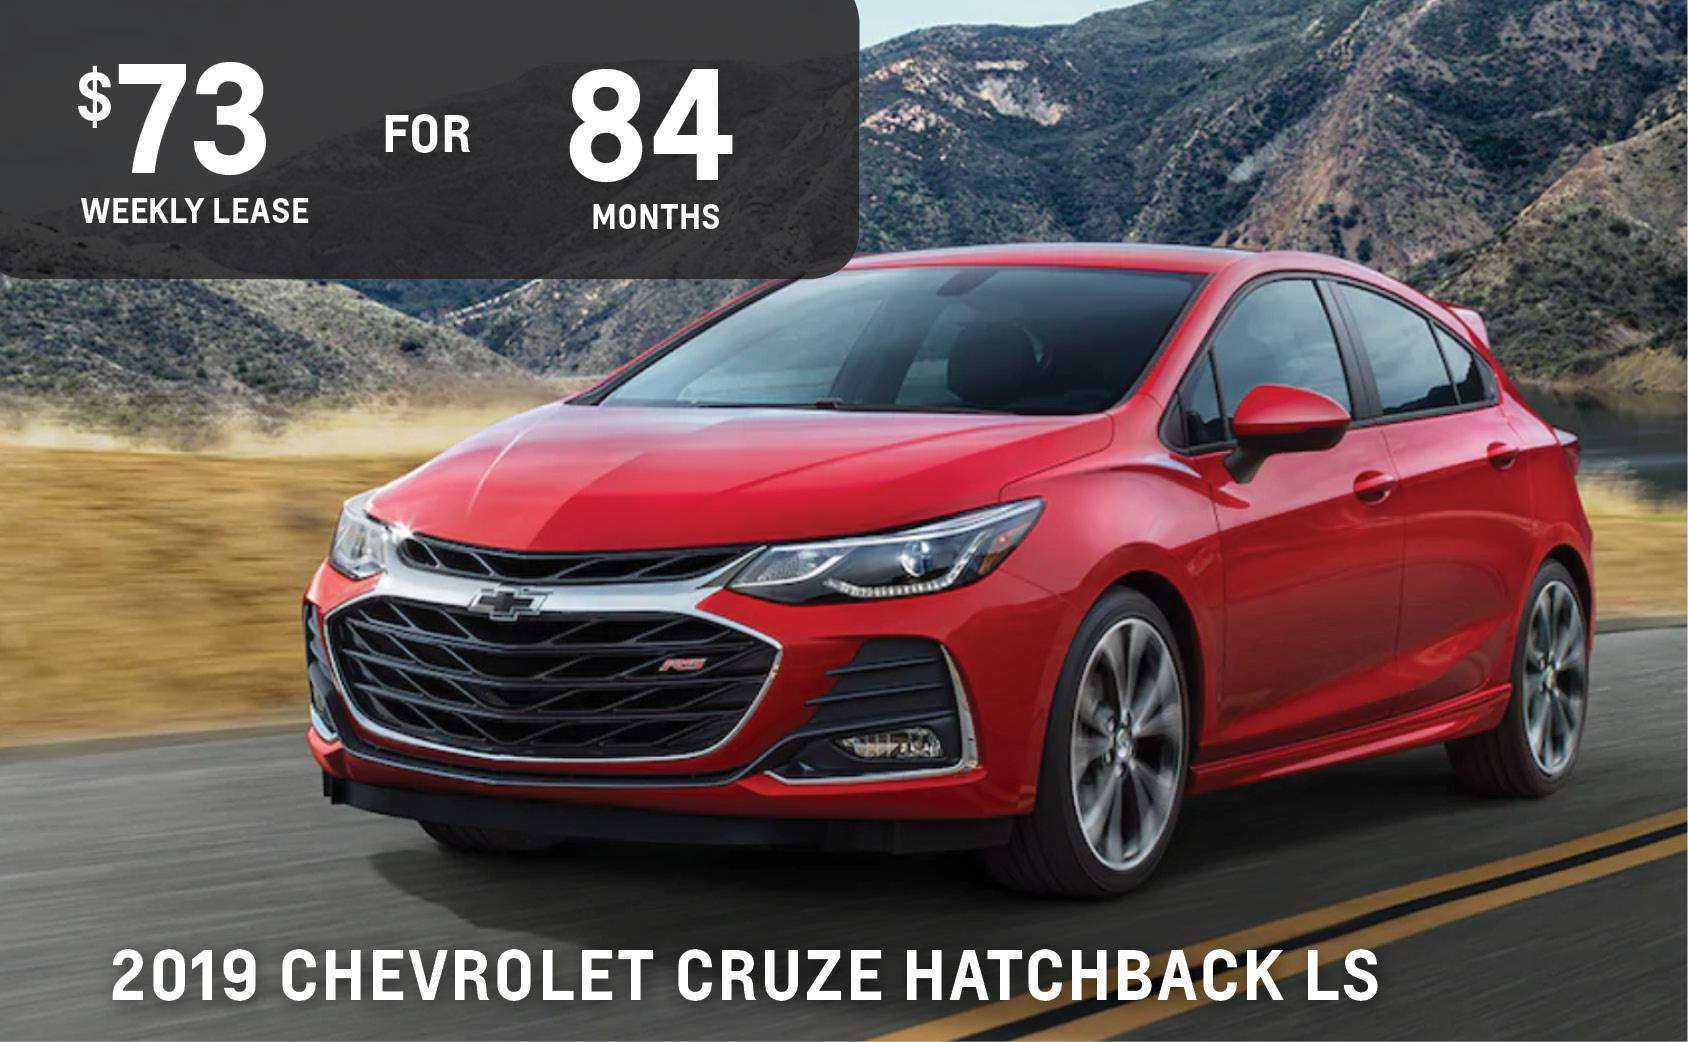 August 2019 Chevrolet Cruze Hatchback Sale Ontario Motor Sales